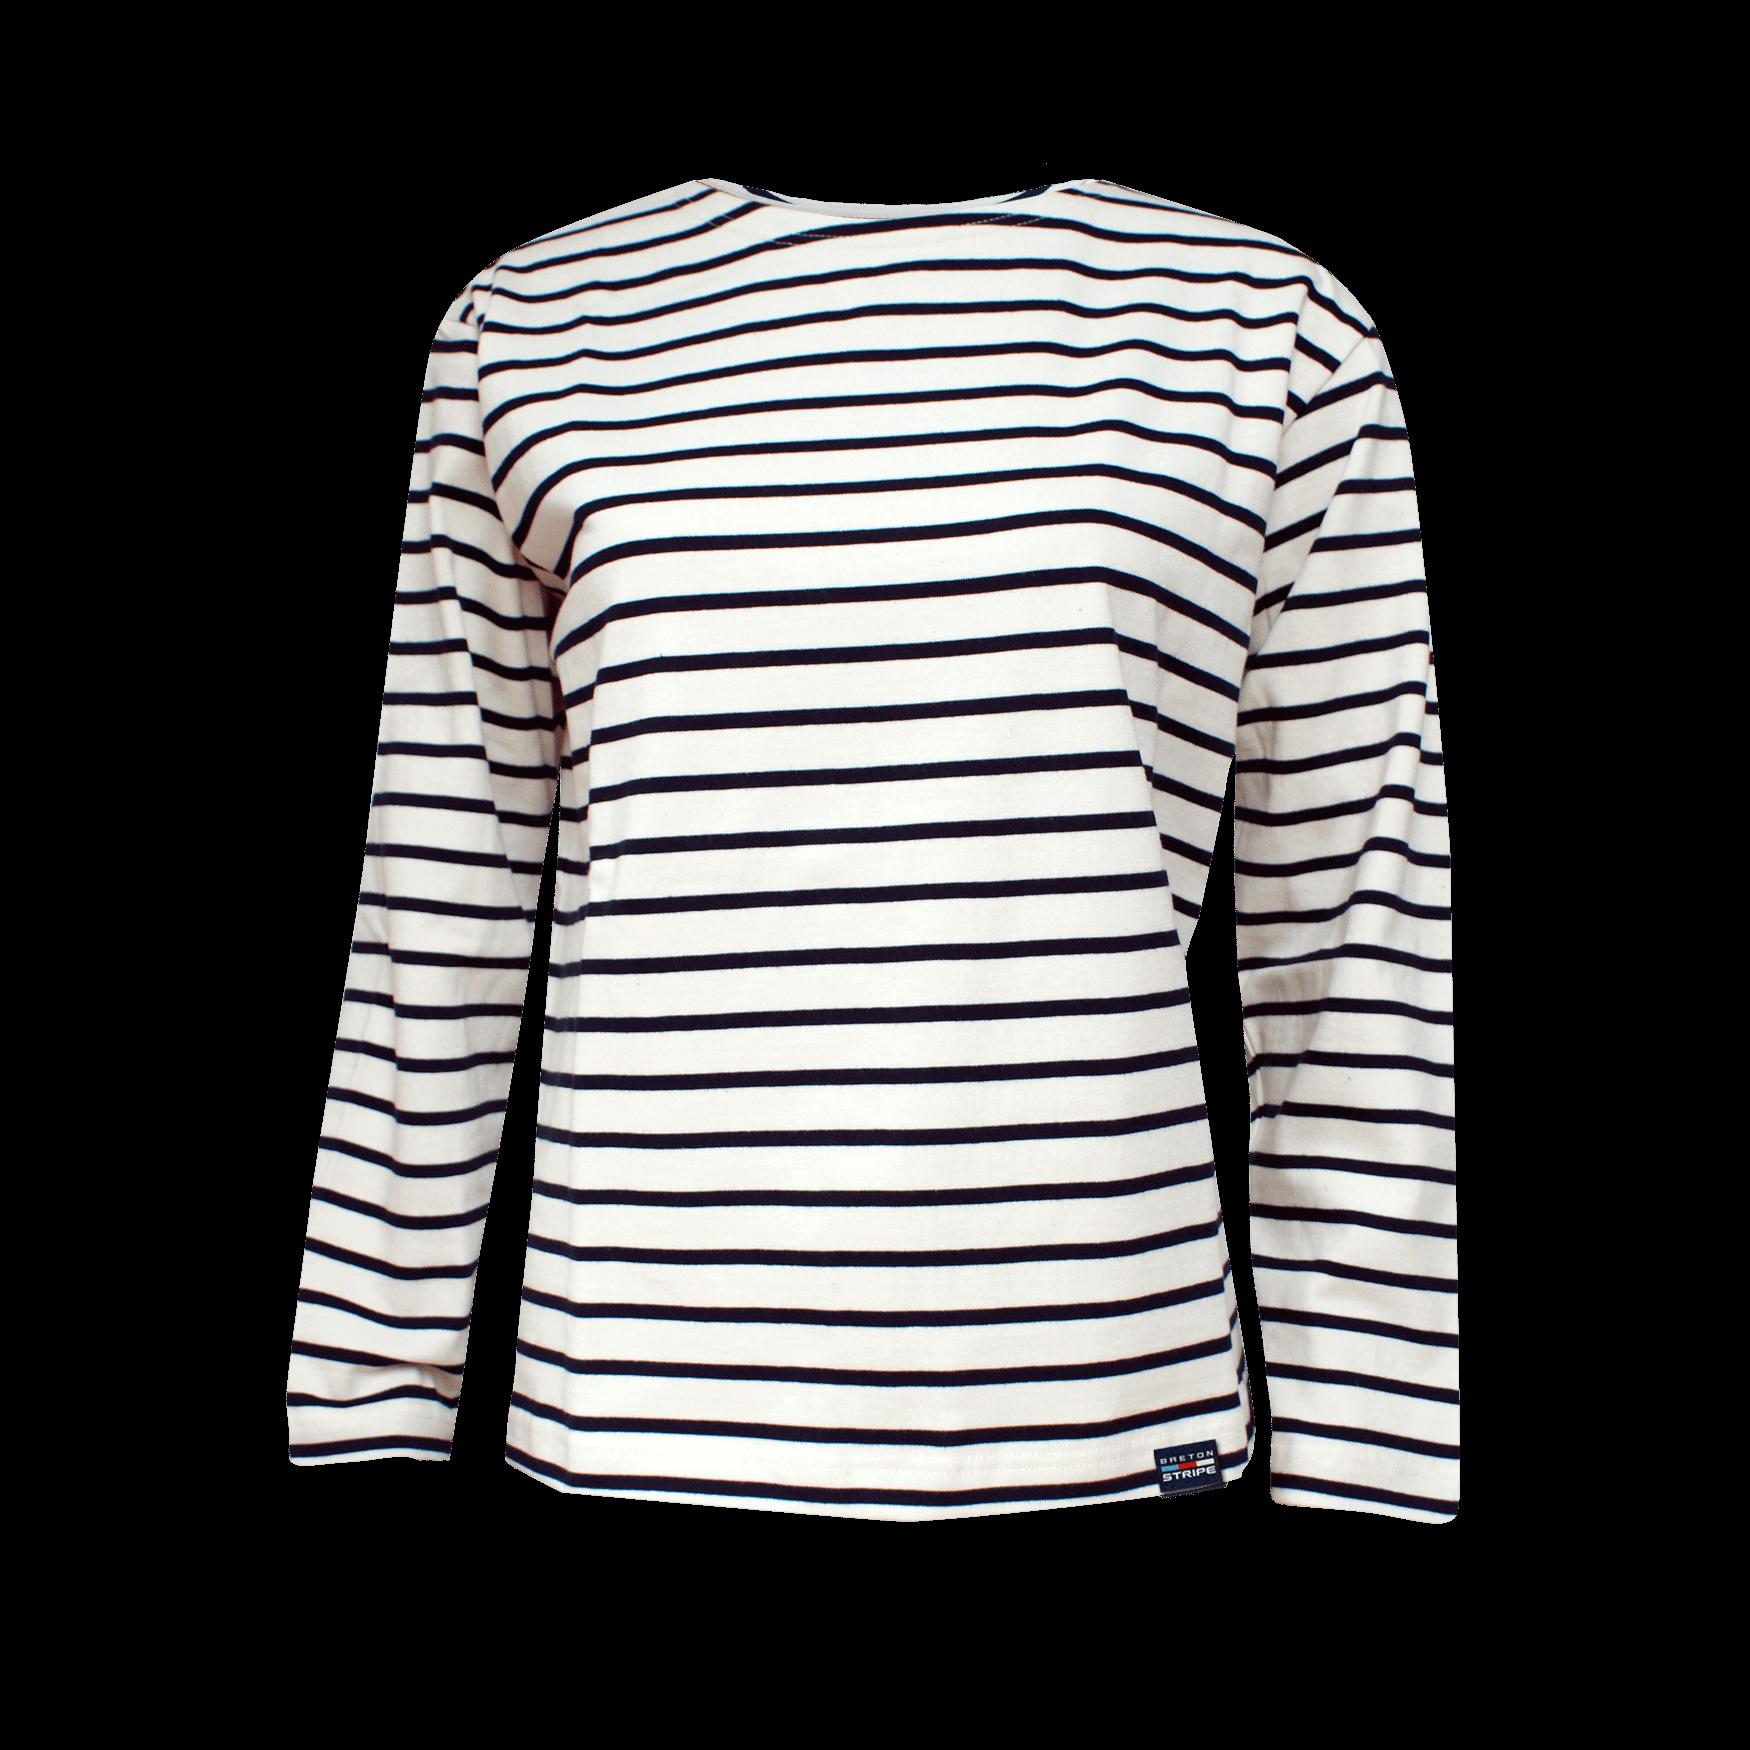 BretonStripe-Classic-shirt-A01-02-natural-navy